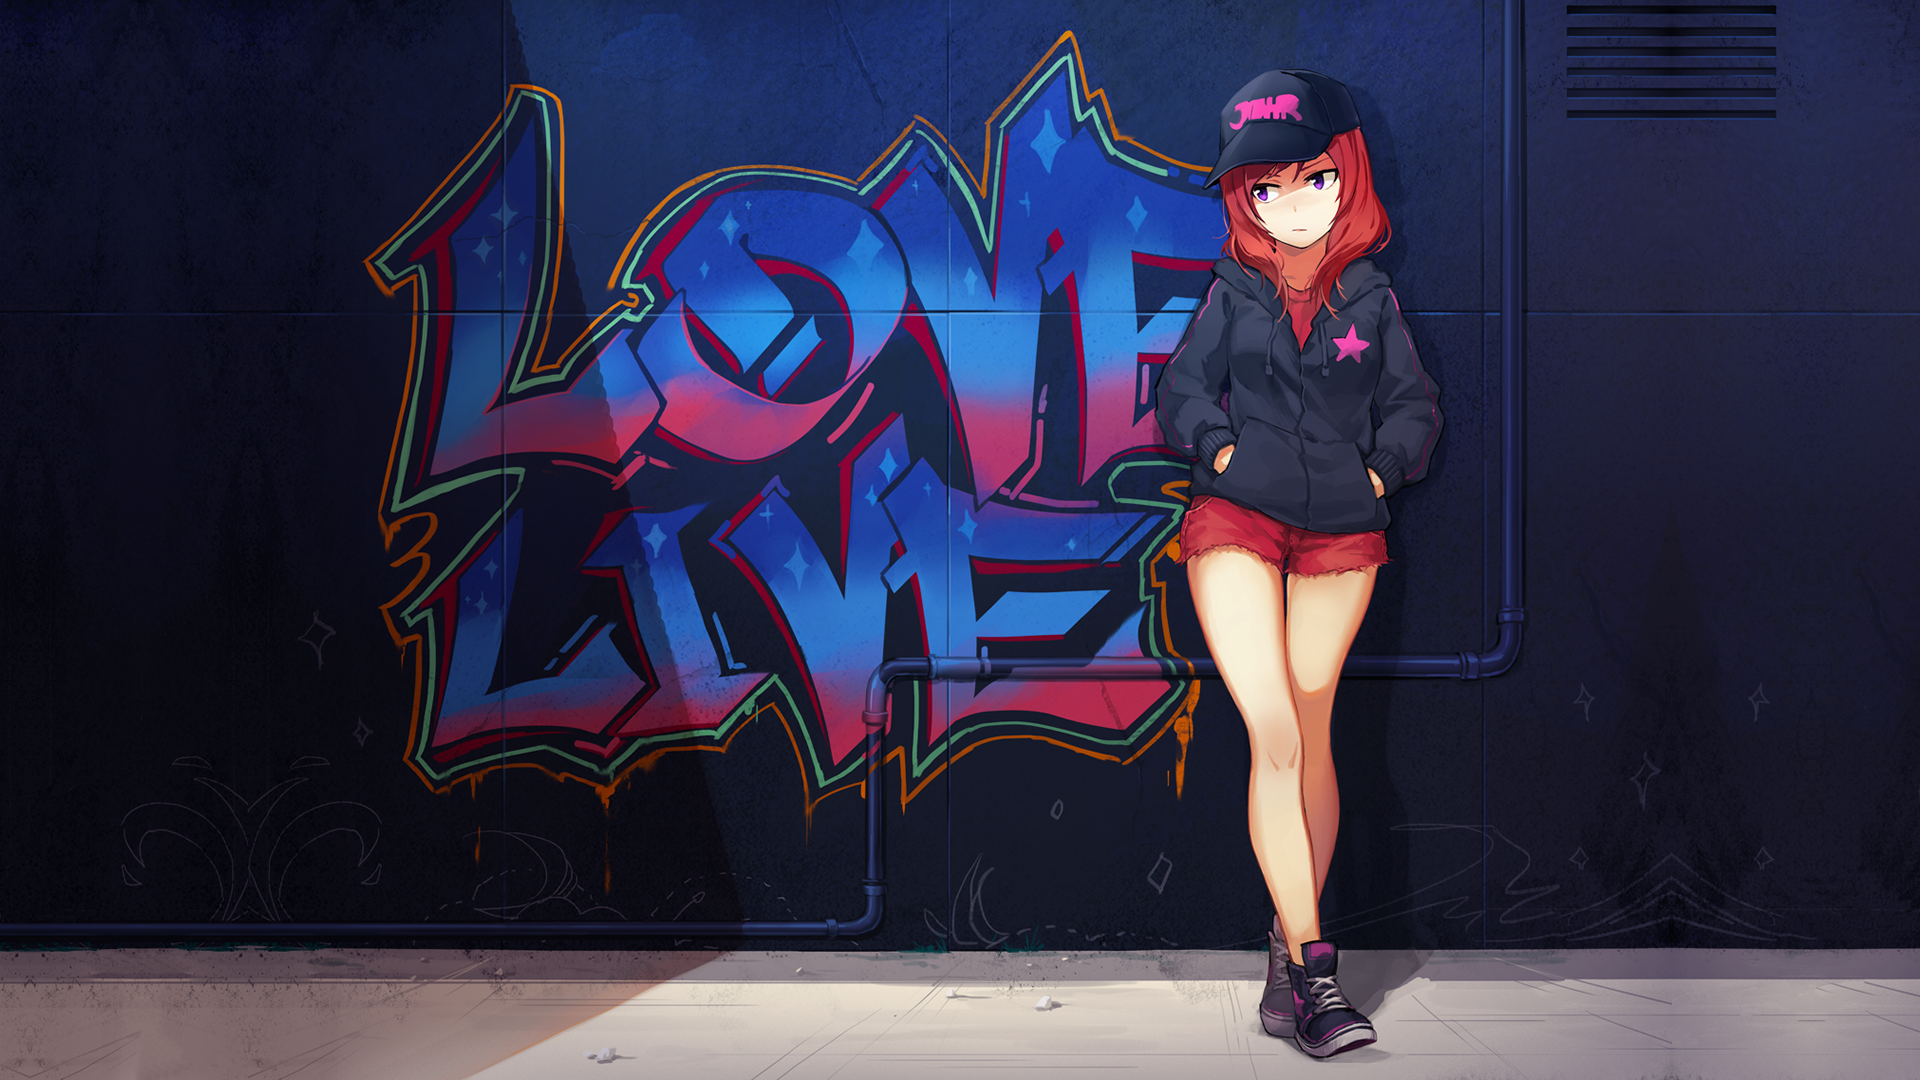 25 Exclusive Graffiti Love Wallpapers